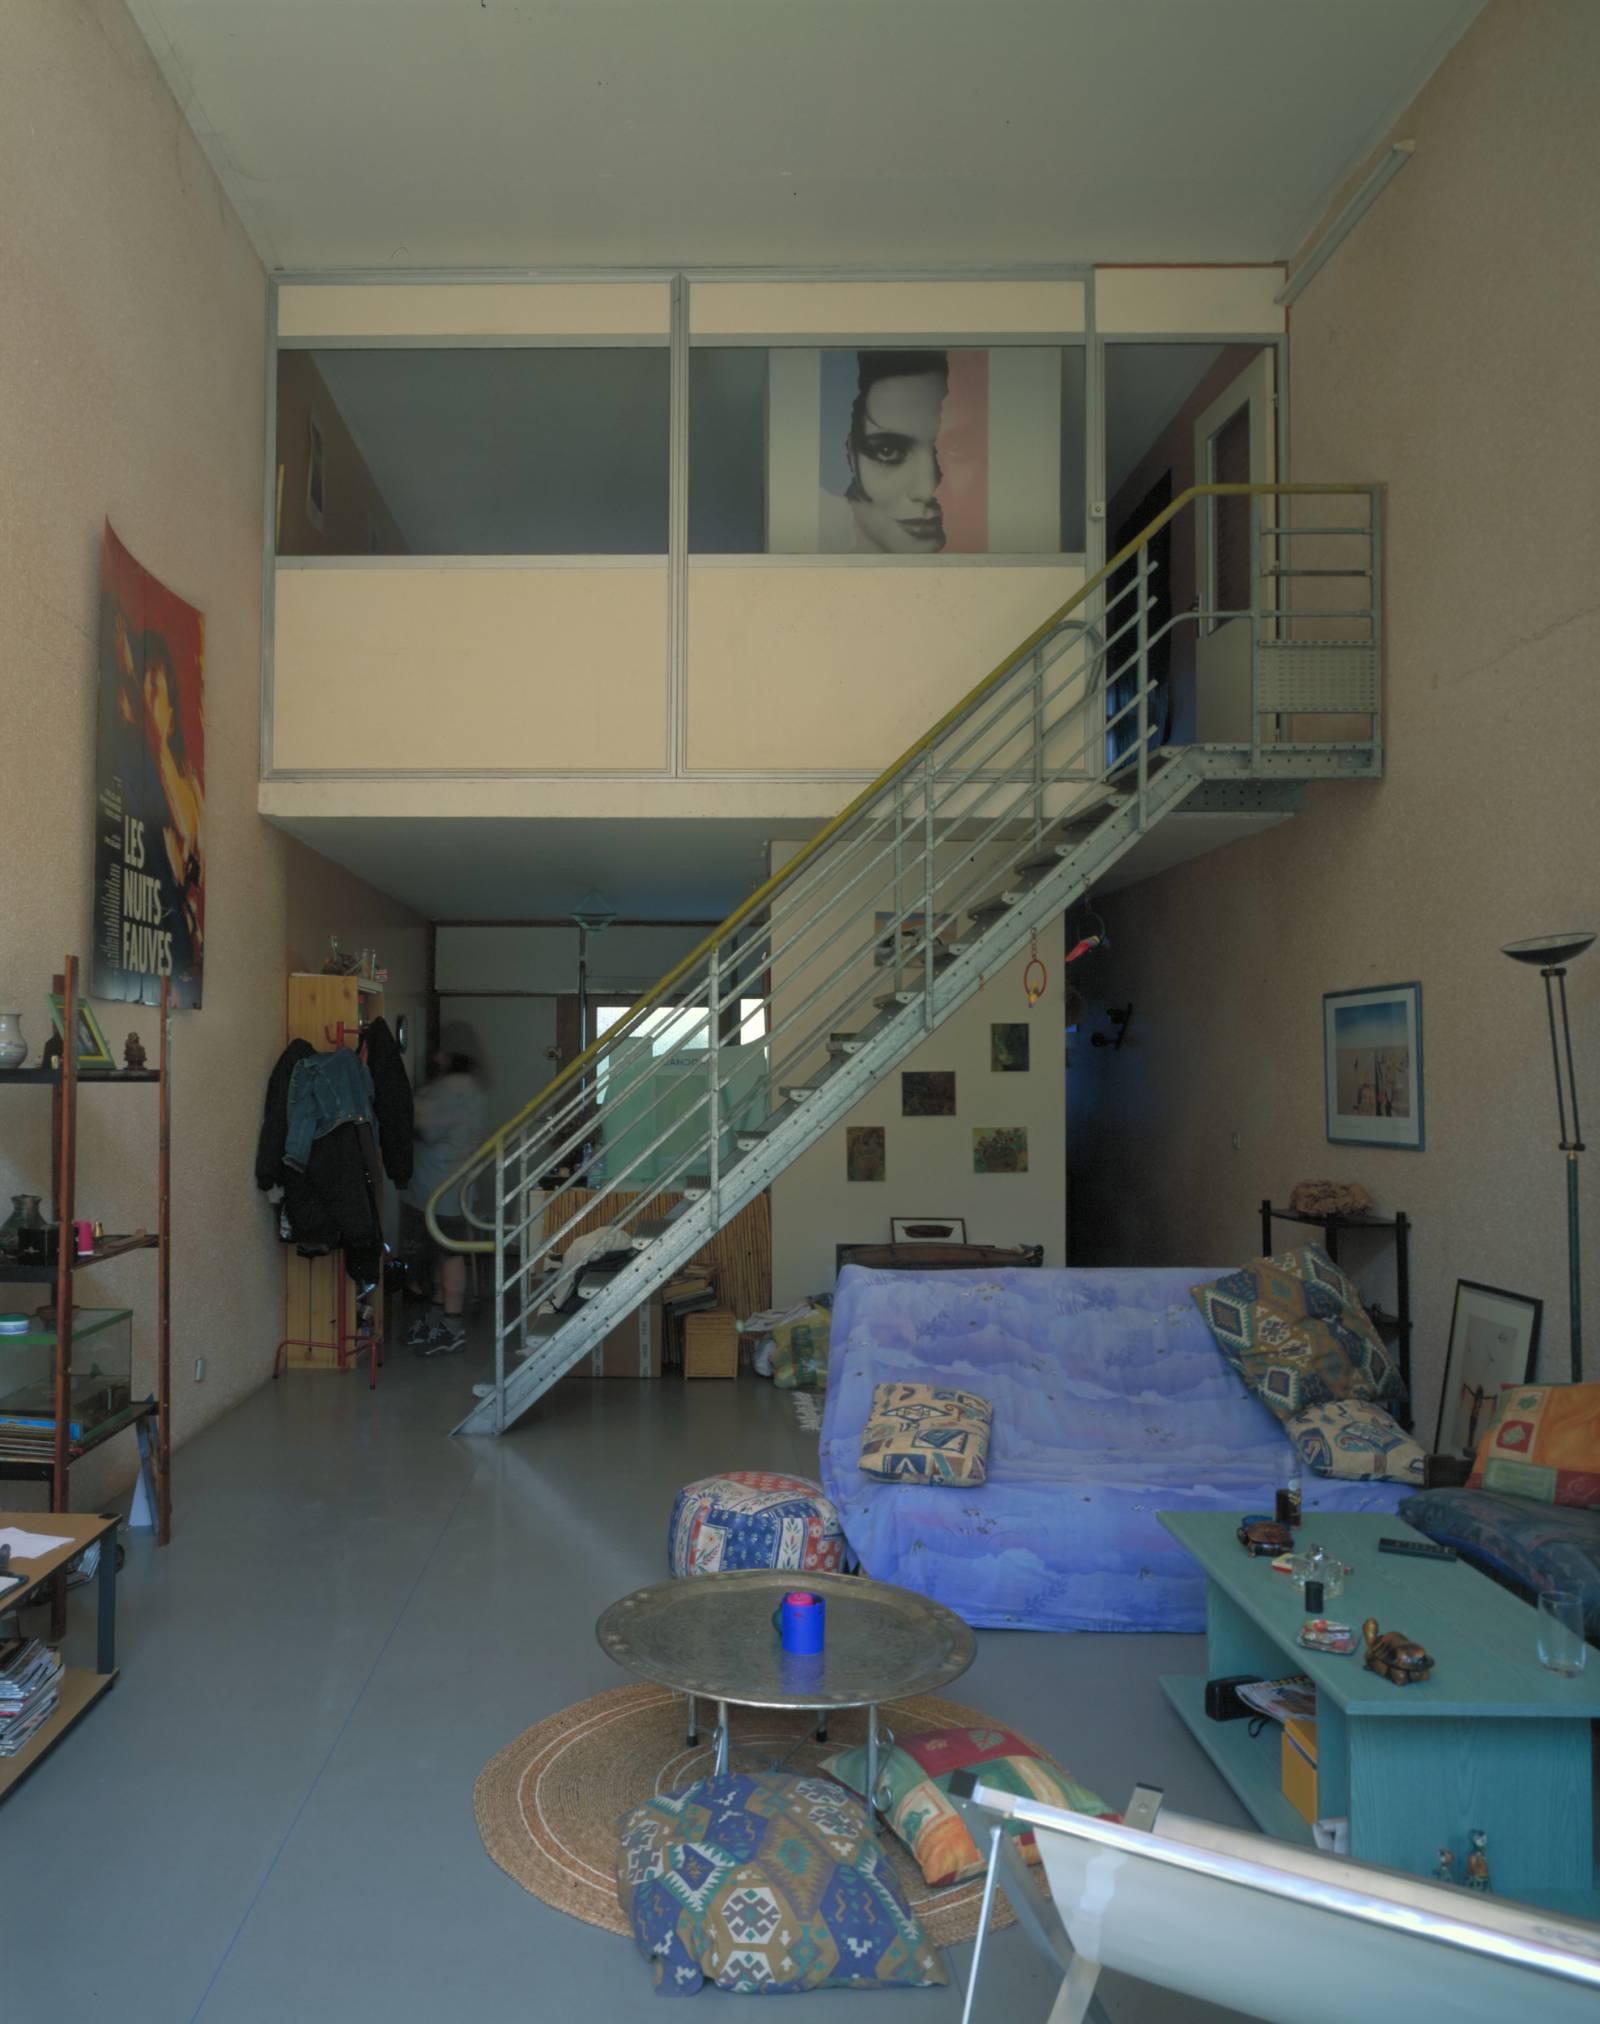 Nemausus Ateliers Jean Nouvel